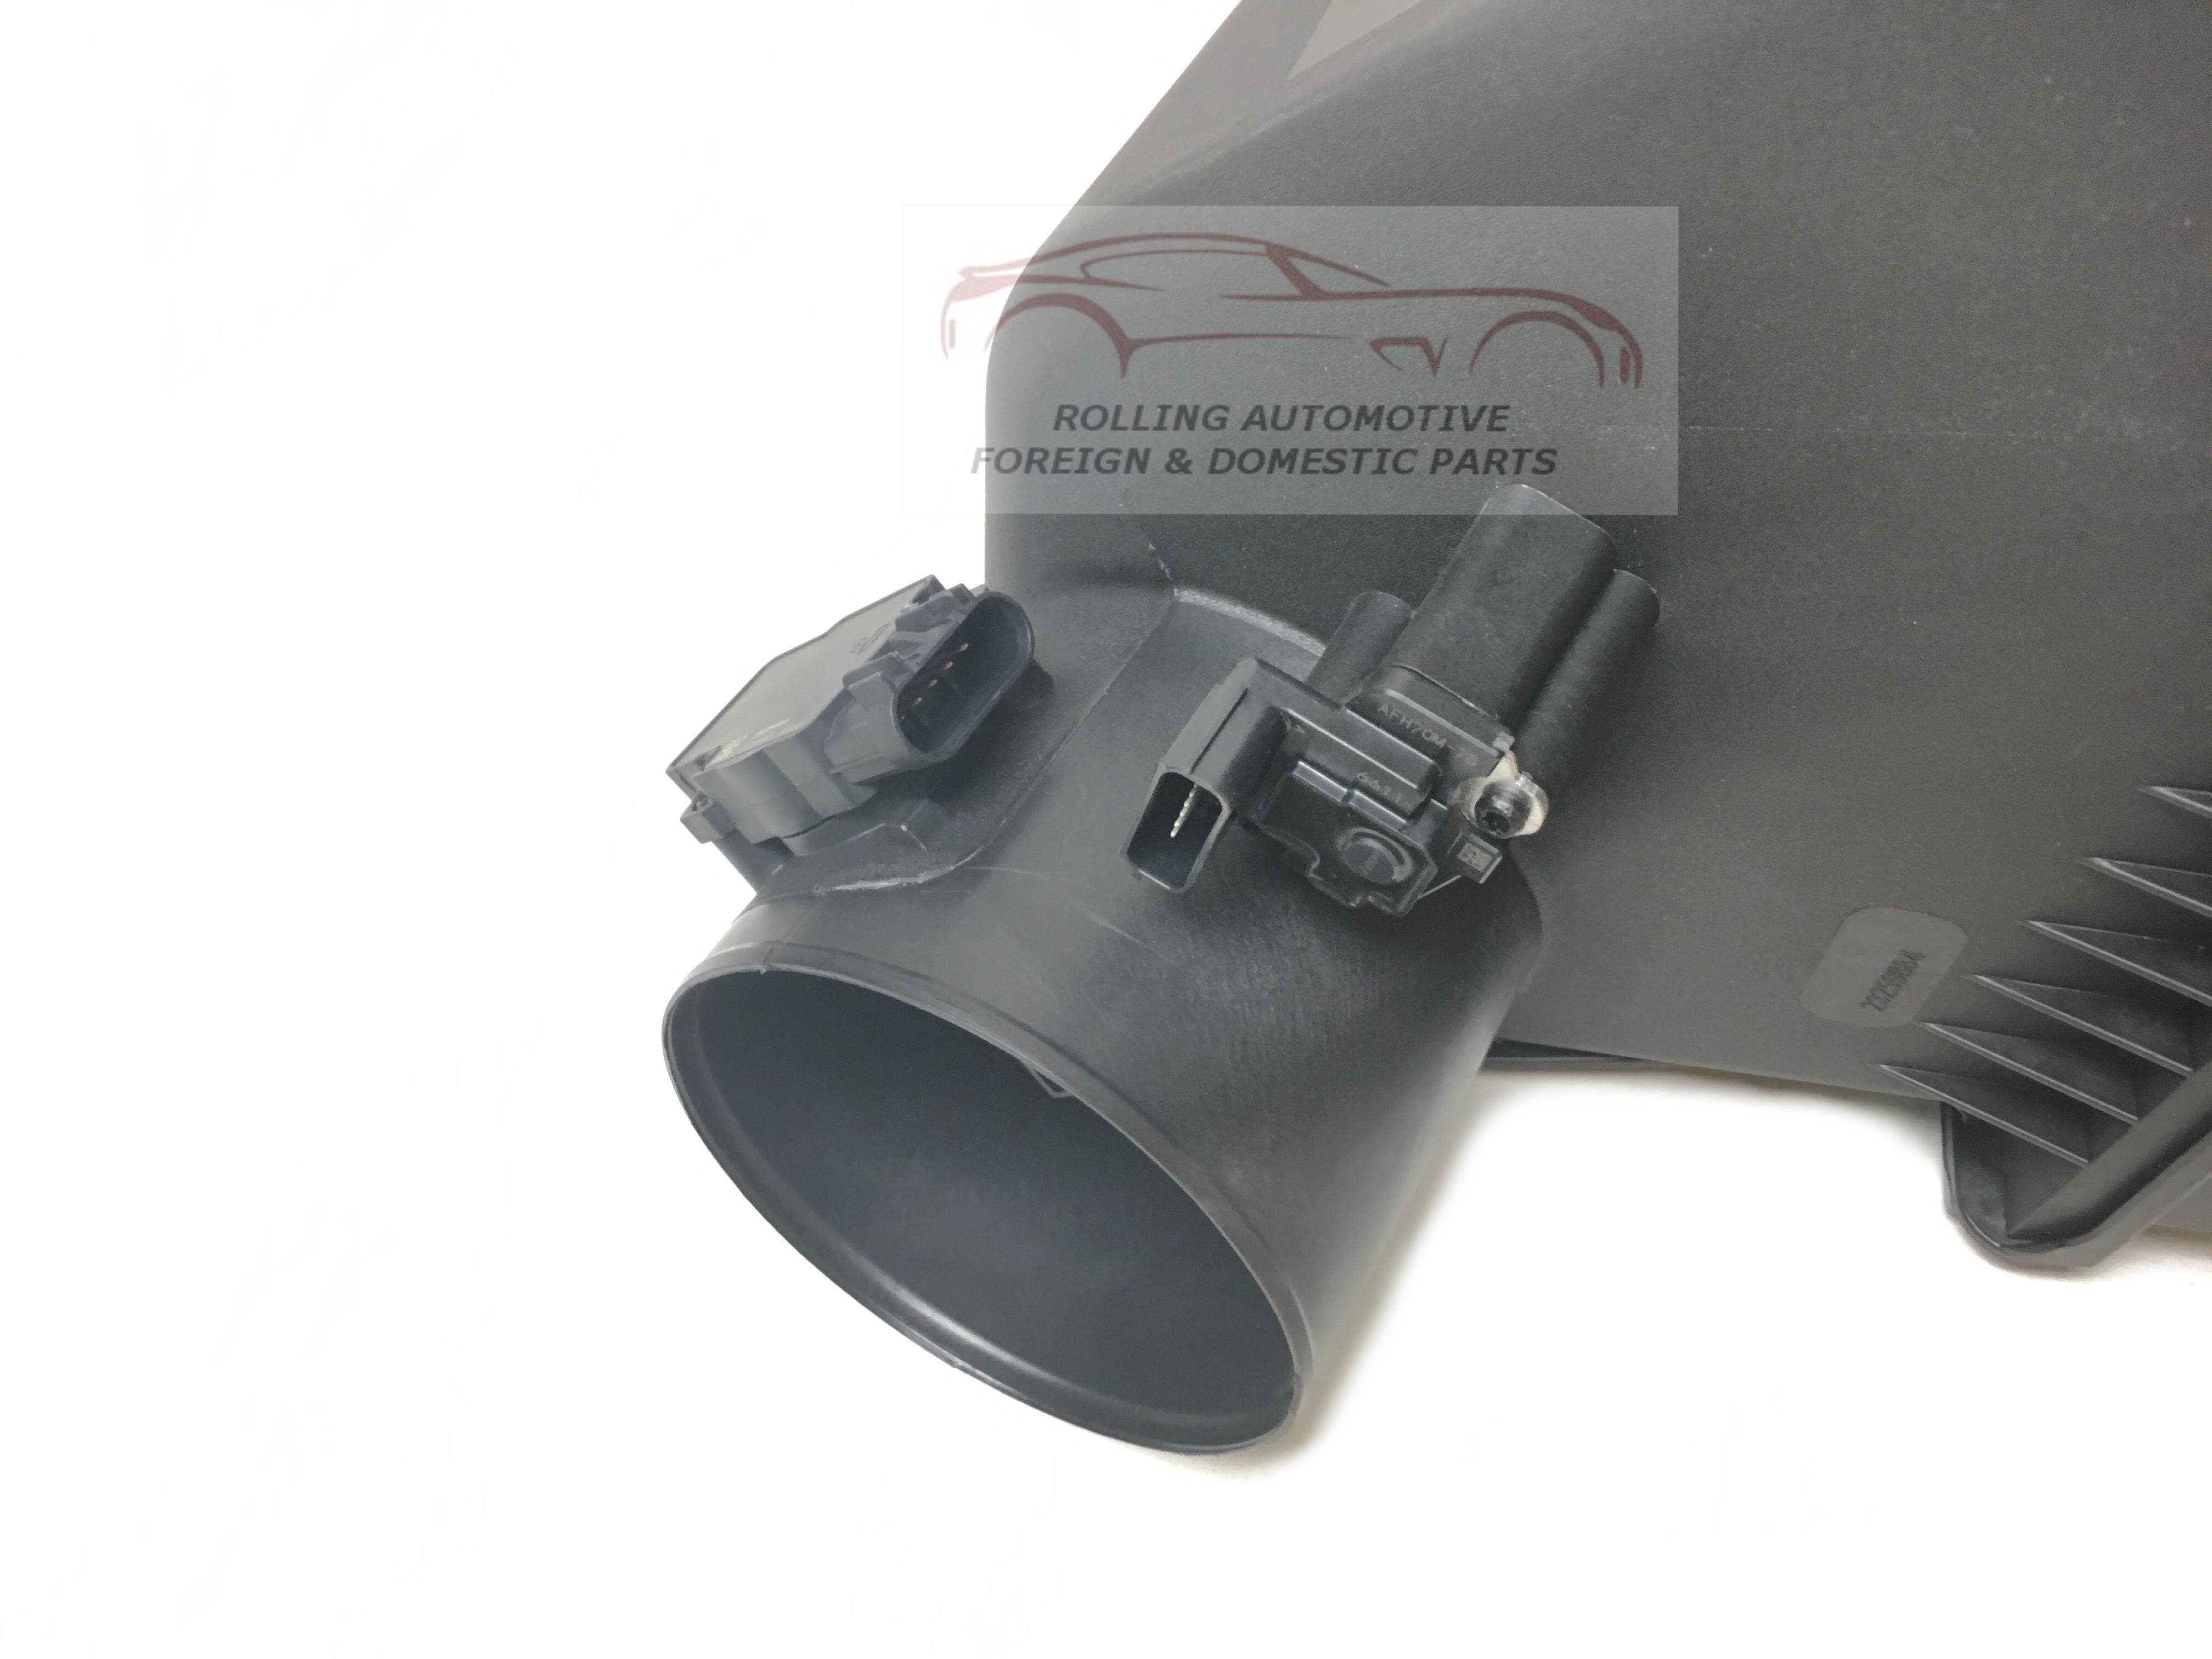 2013 2014 2015 2016 Chevrolet Silverado Gmc Sierra 66 Duramax Diesel Fuel Filter Housing Air Cleaner Box Assembly New Oem